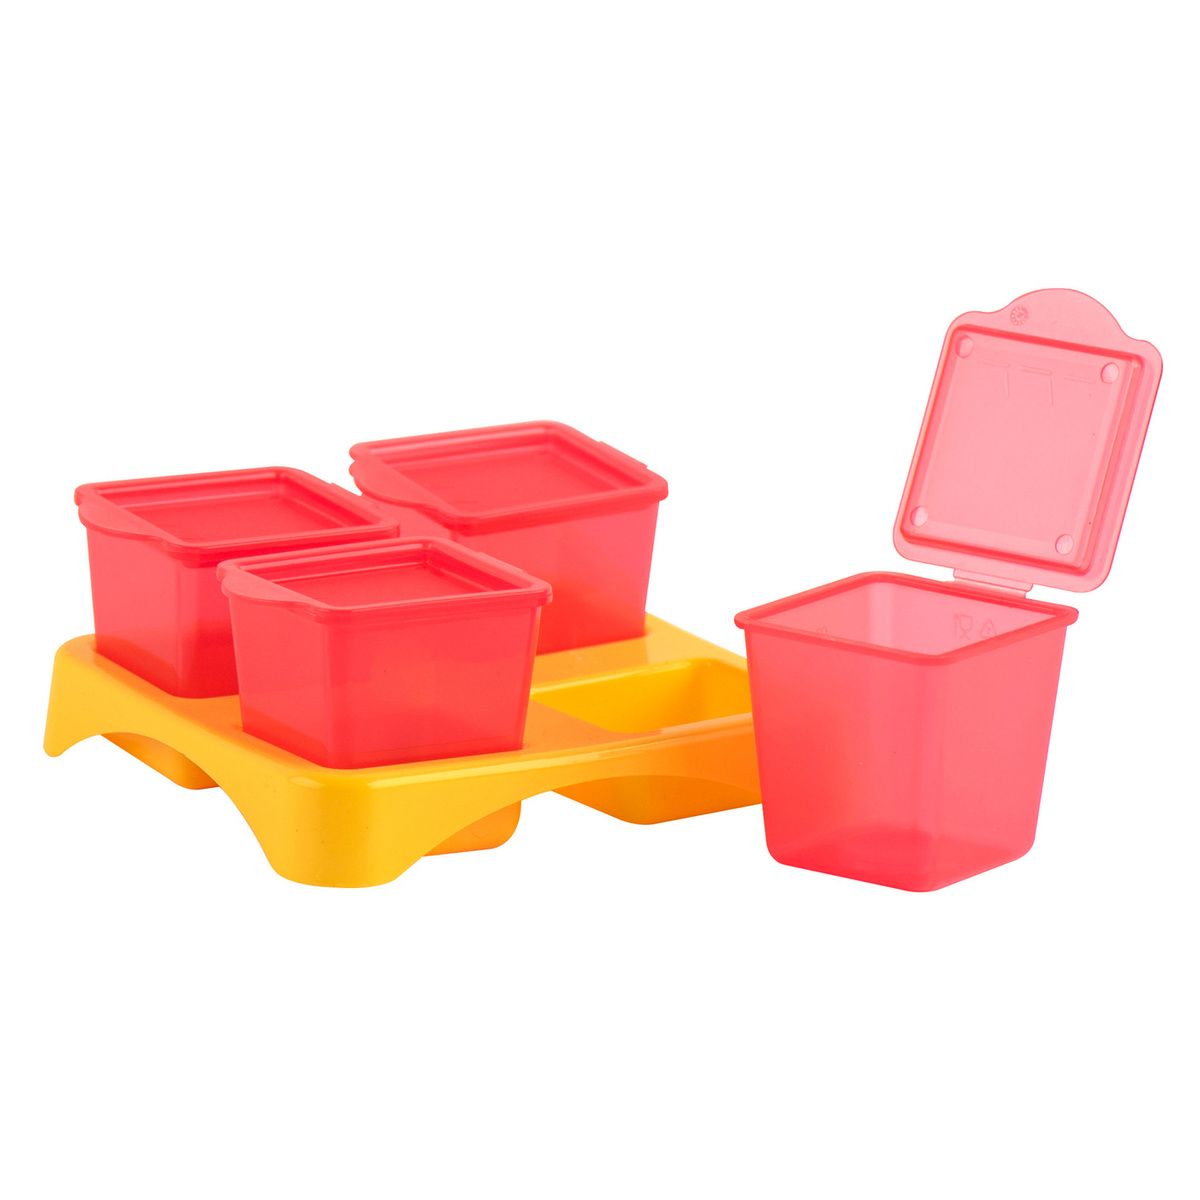 TUBIK Контейнеры для хранения еды Гравитационные контейнеры  #1